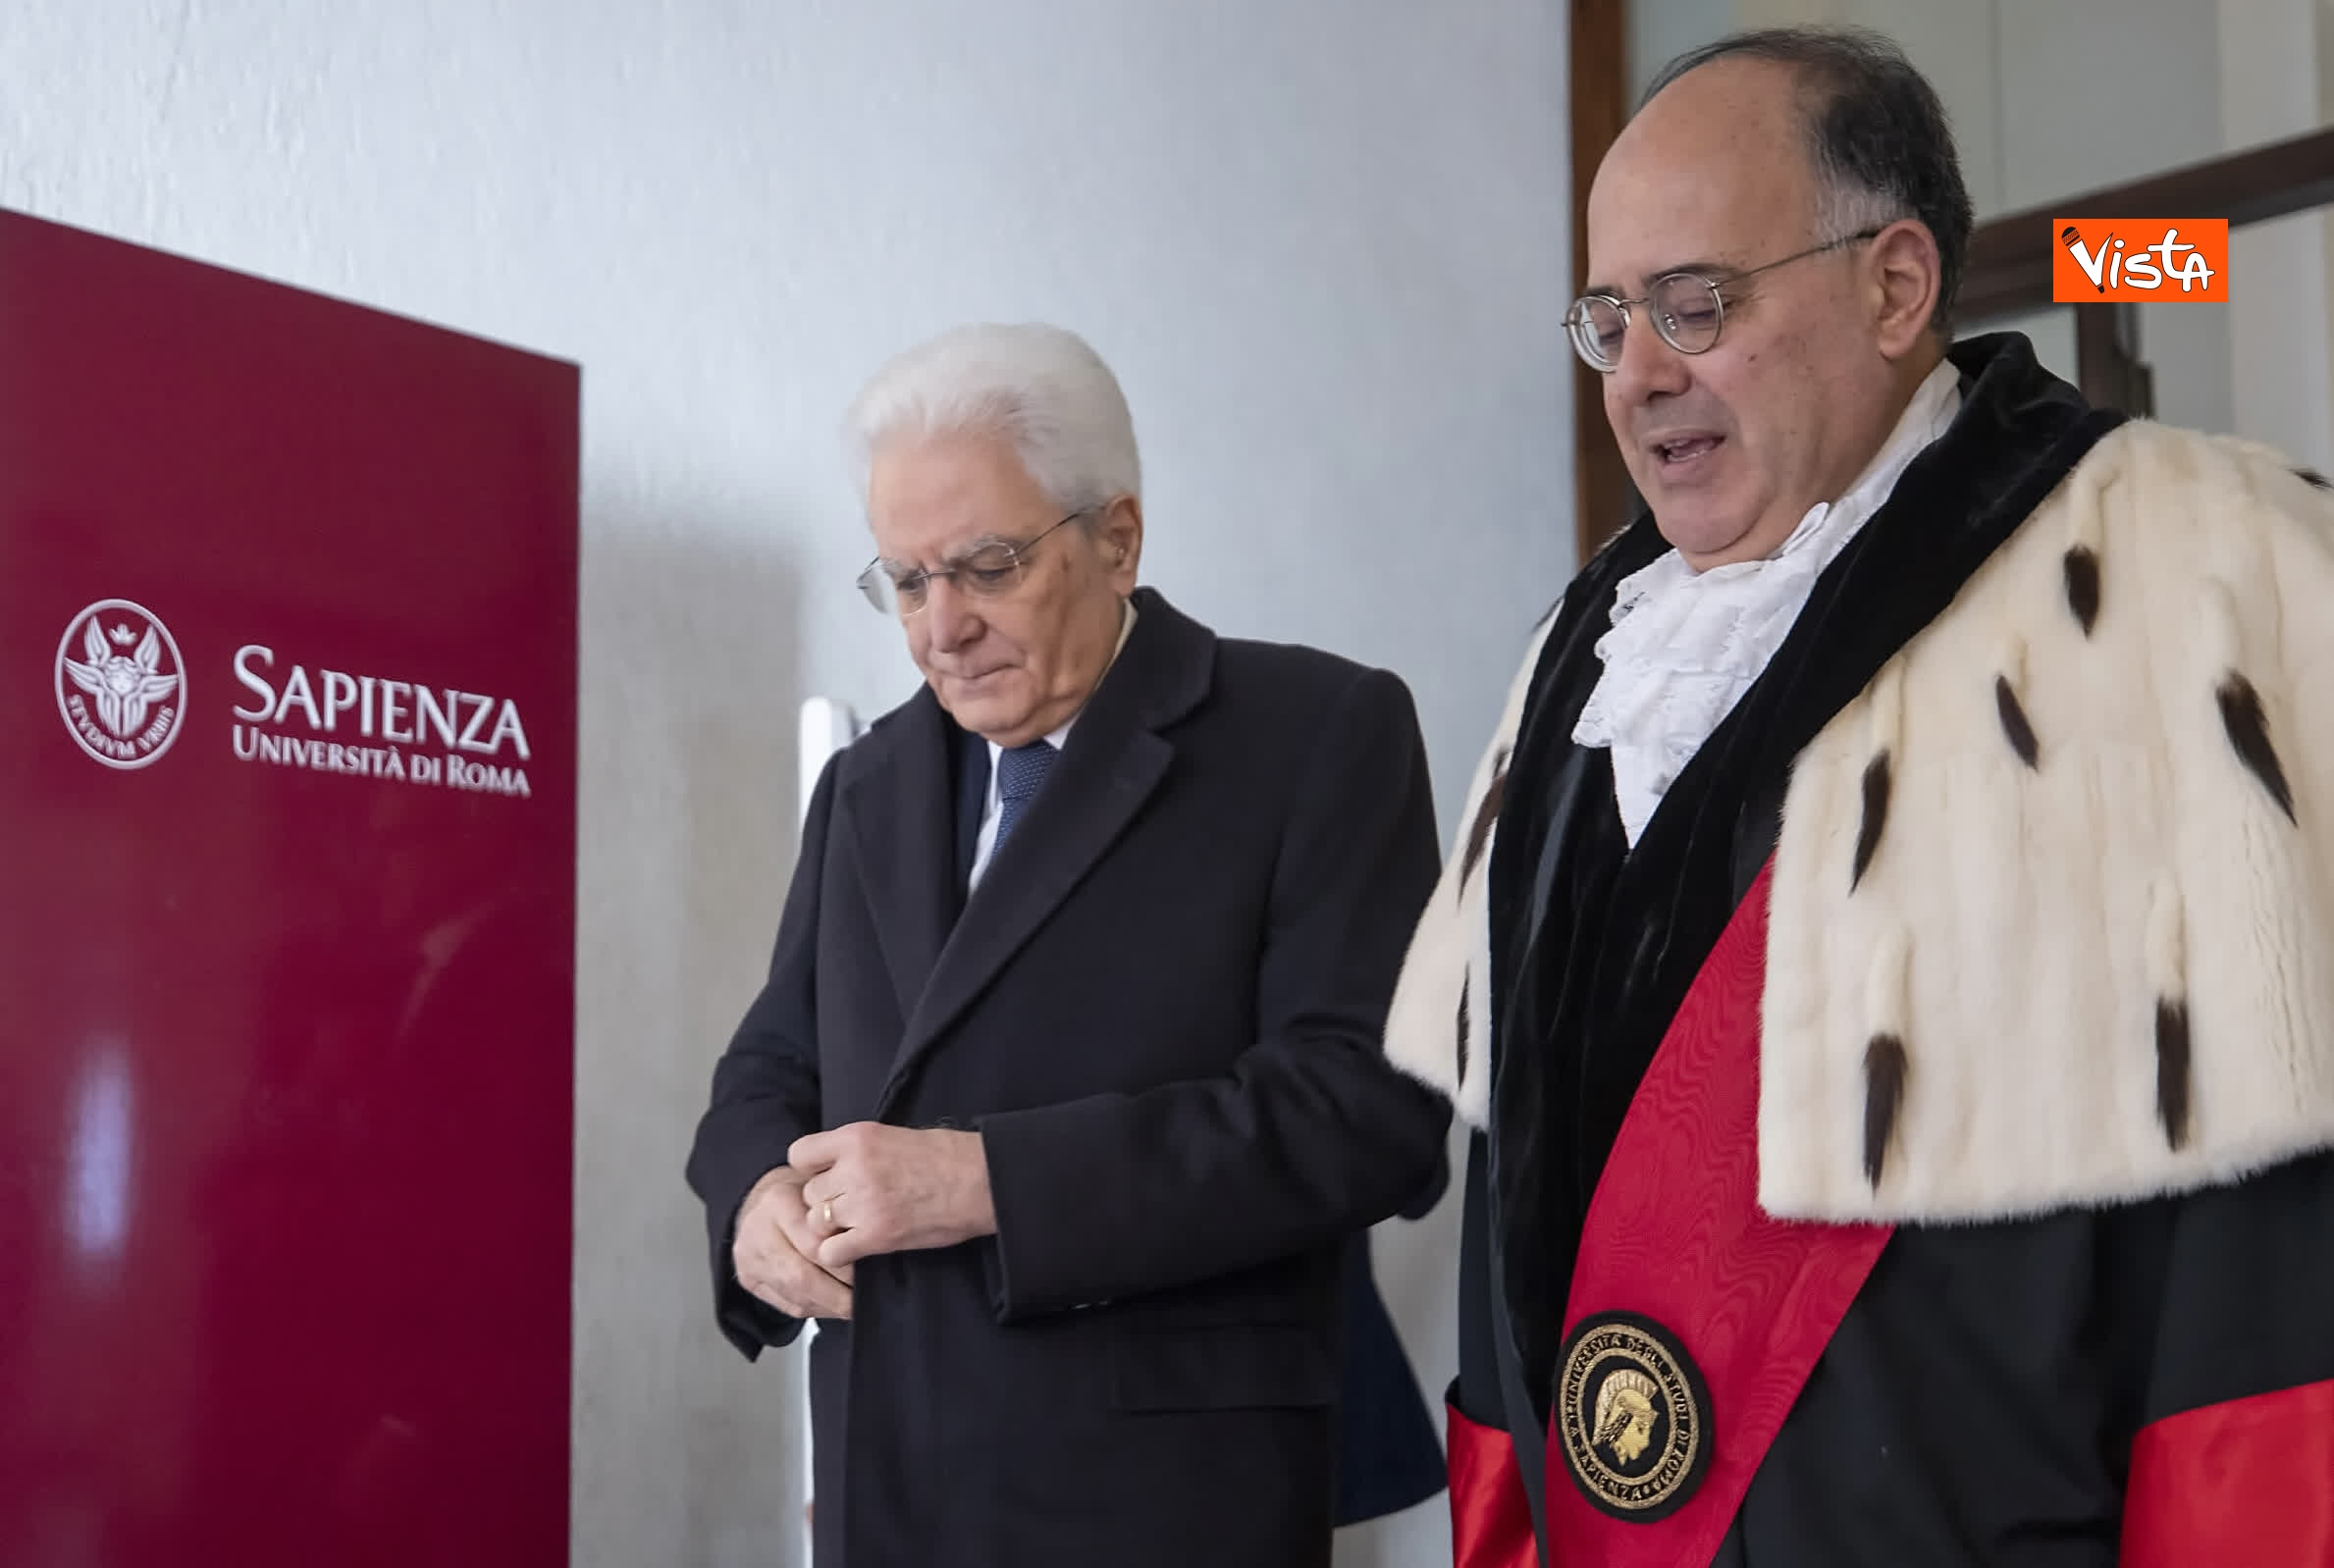 17-02-20 Segre riceve laurea honoris causa dal rettore della Sapienza Gaudio_08